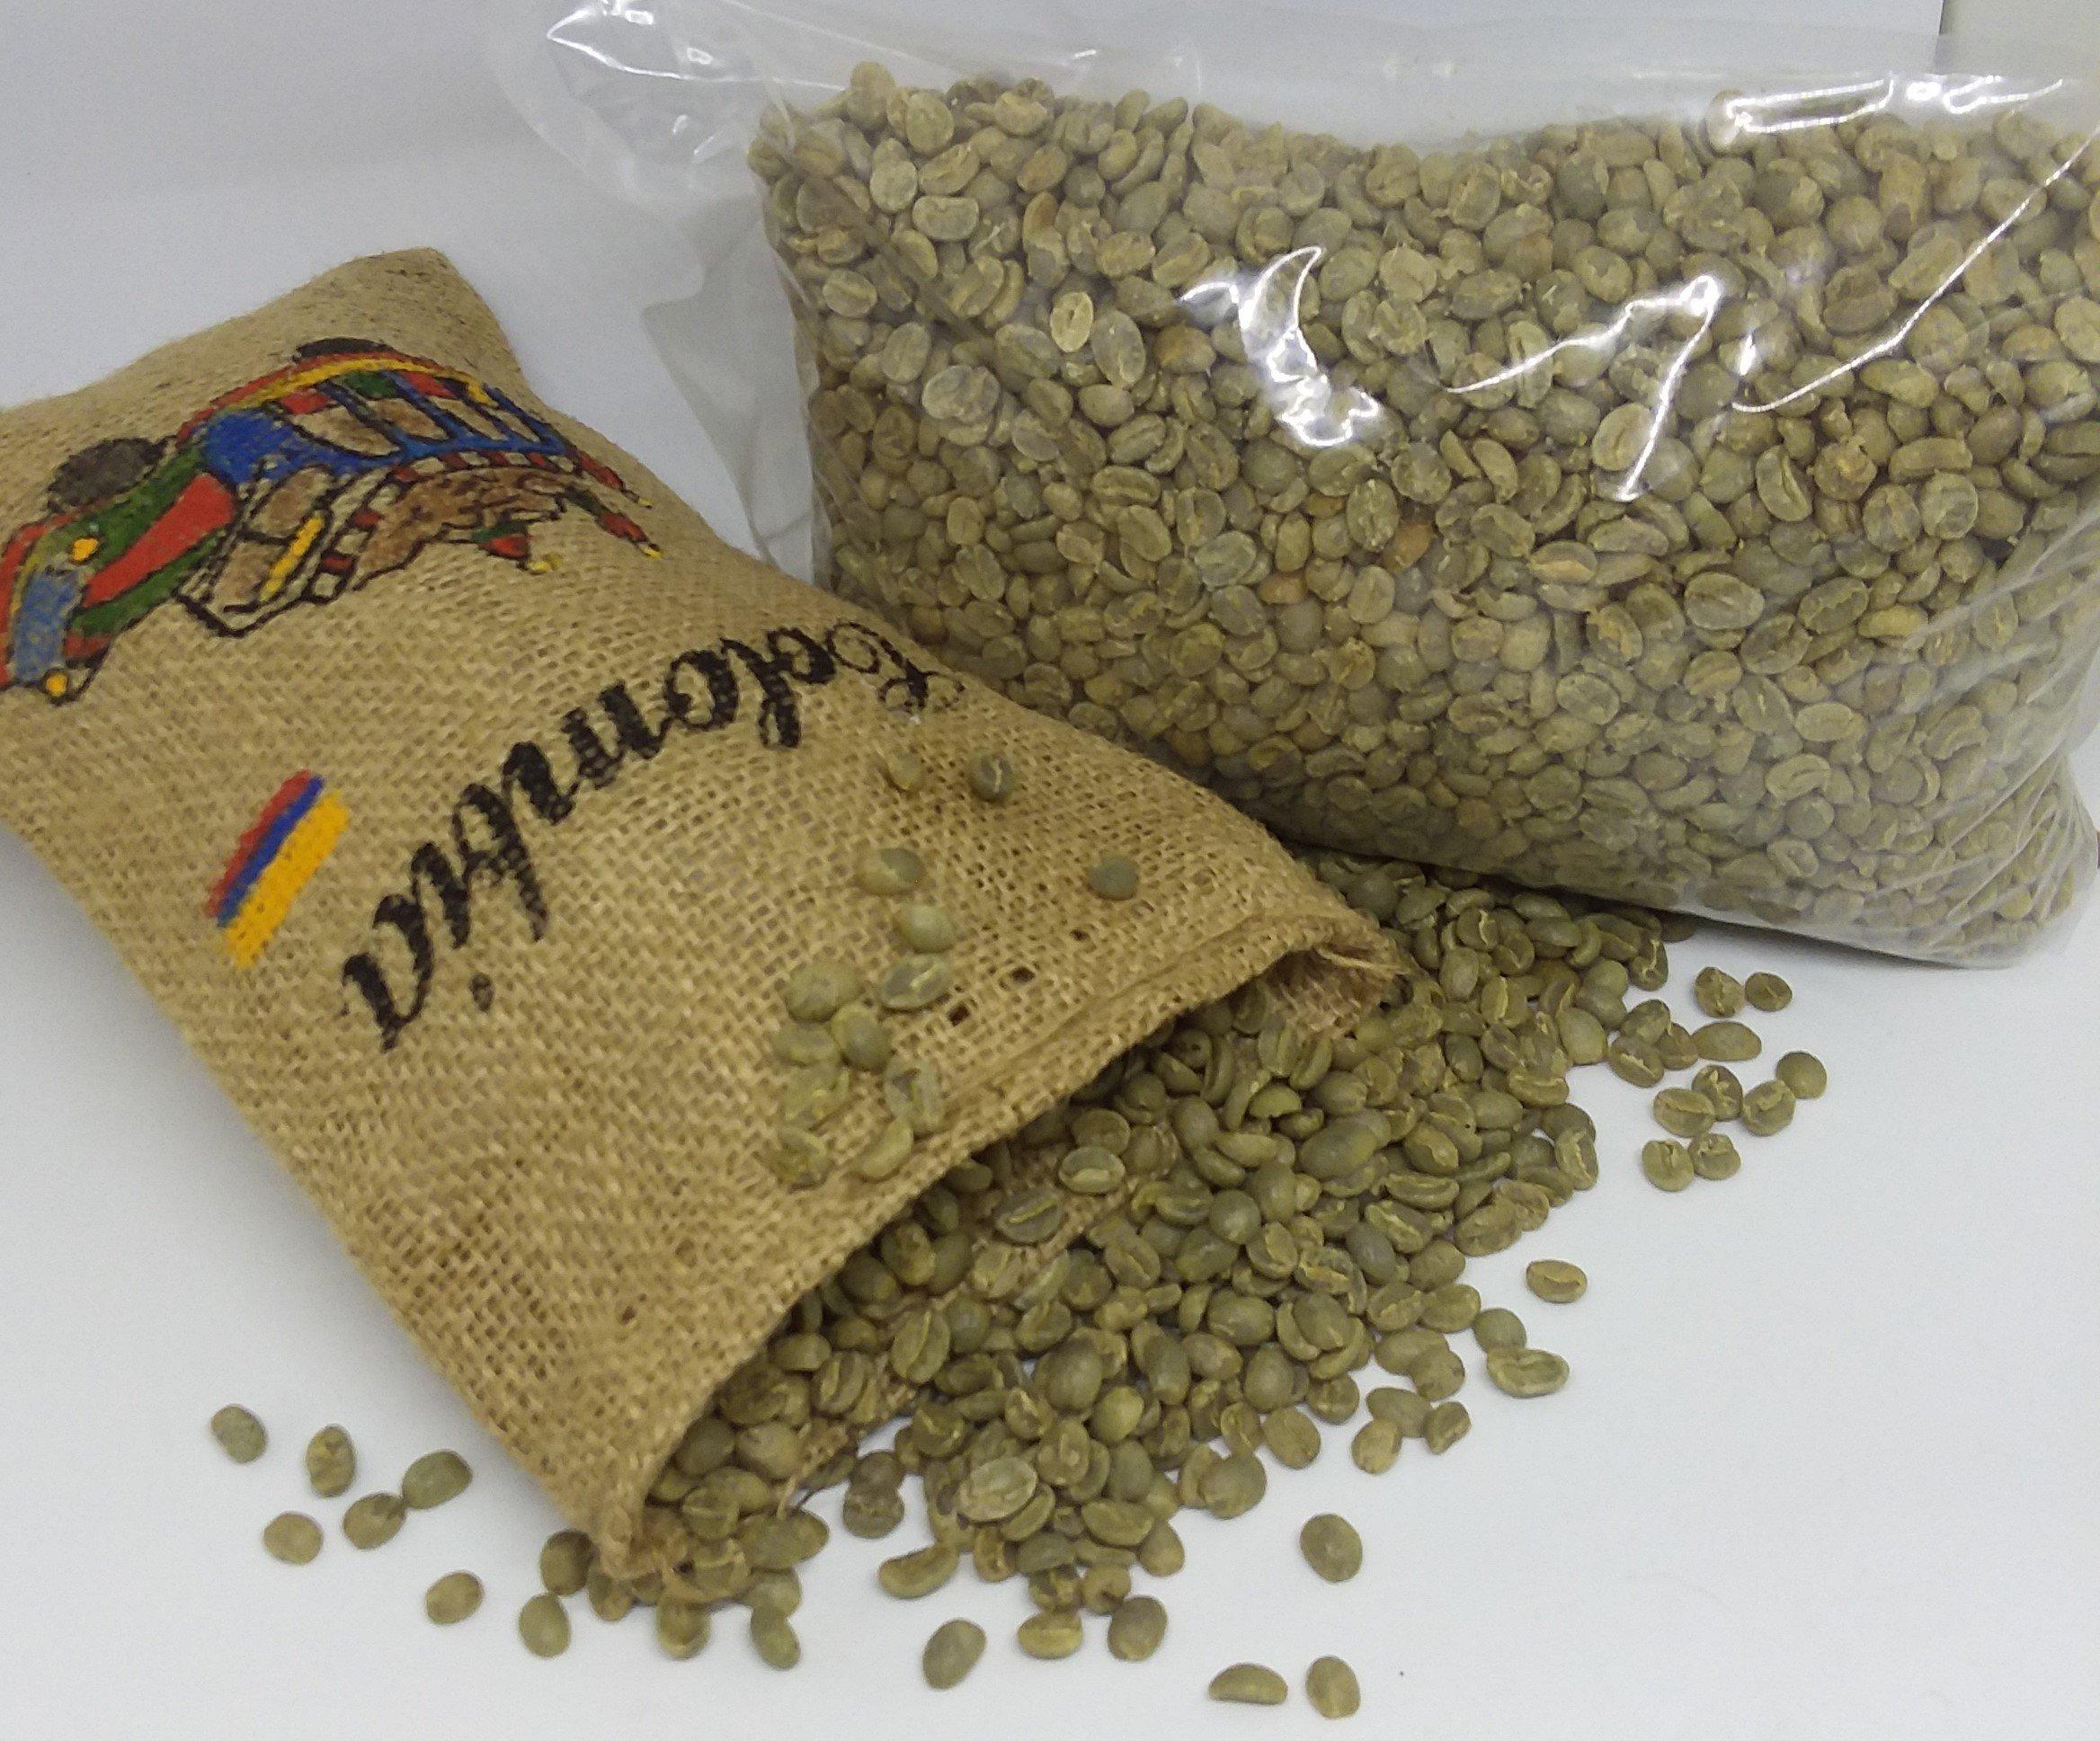 Unroasted Green Coffee Beans Special micro lot Farm La Compañia (25 LB) by Micro-Lot: # 148